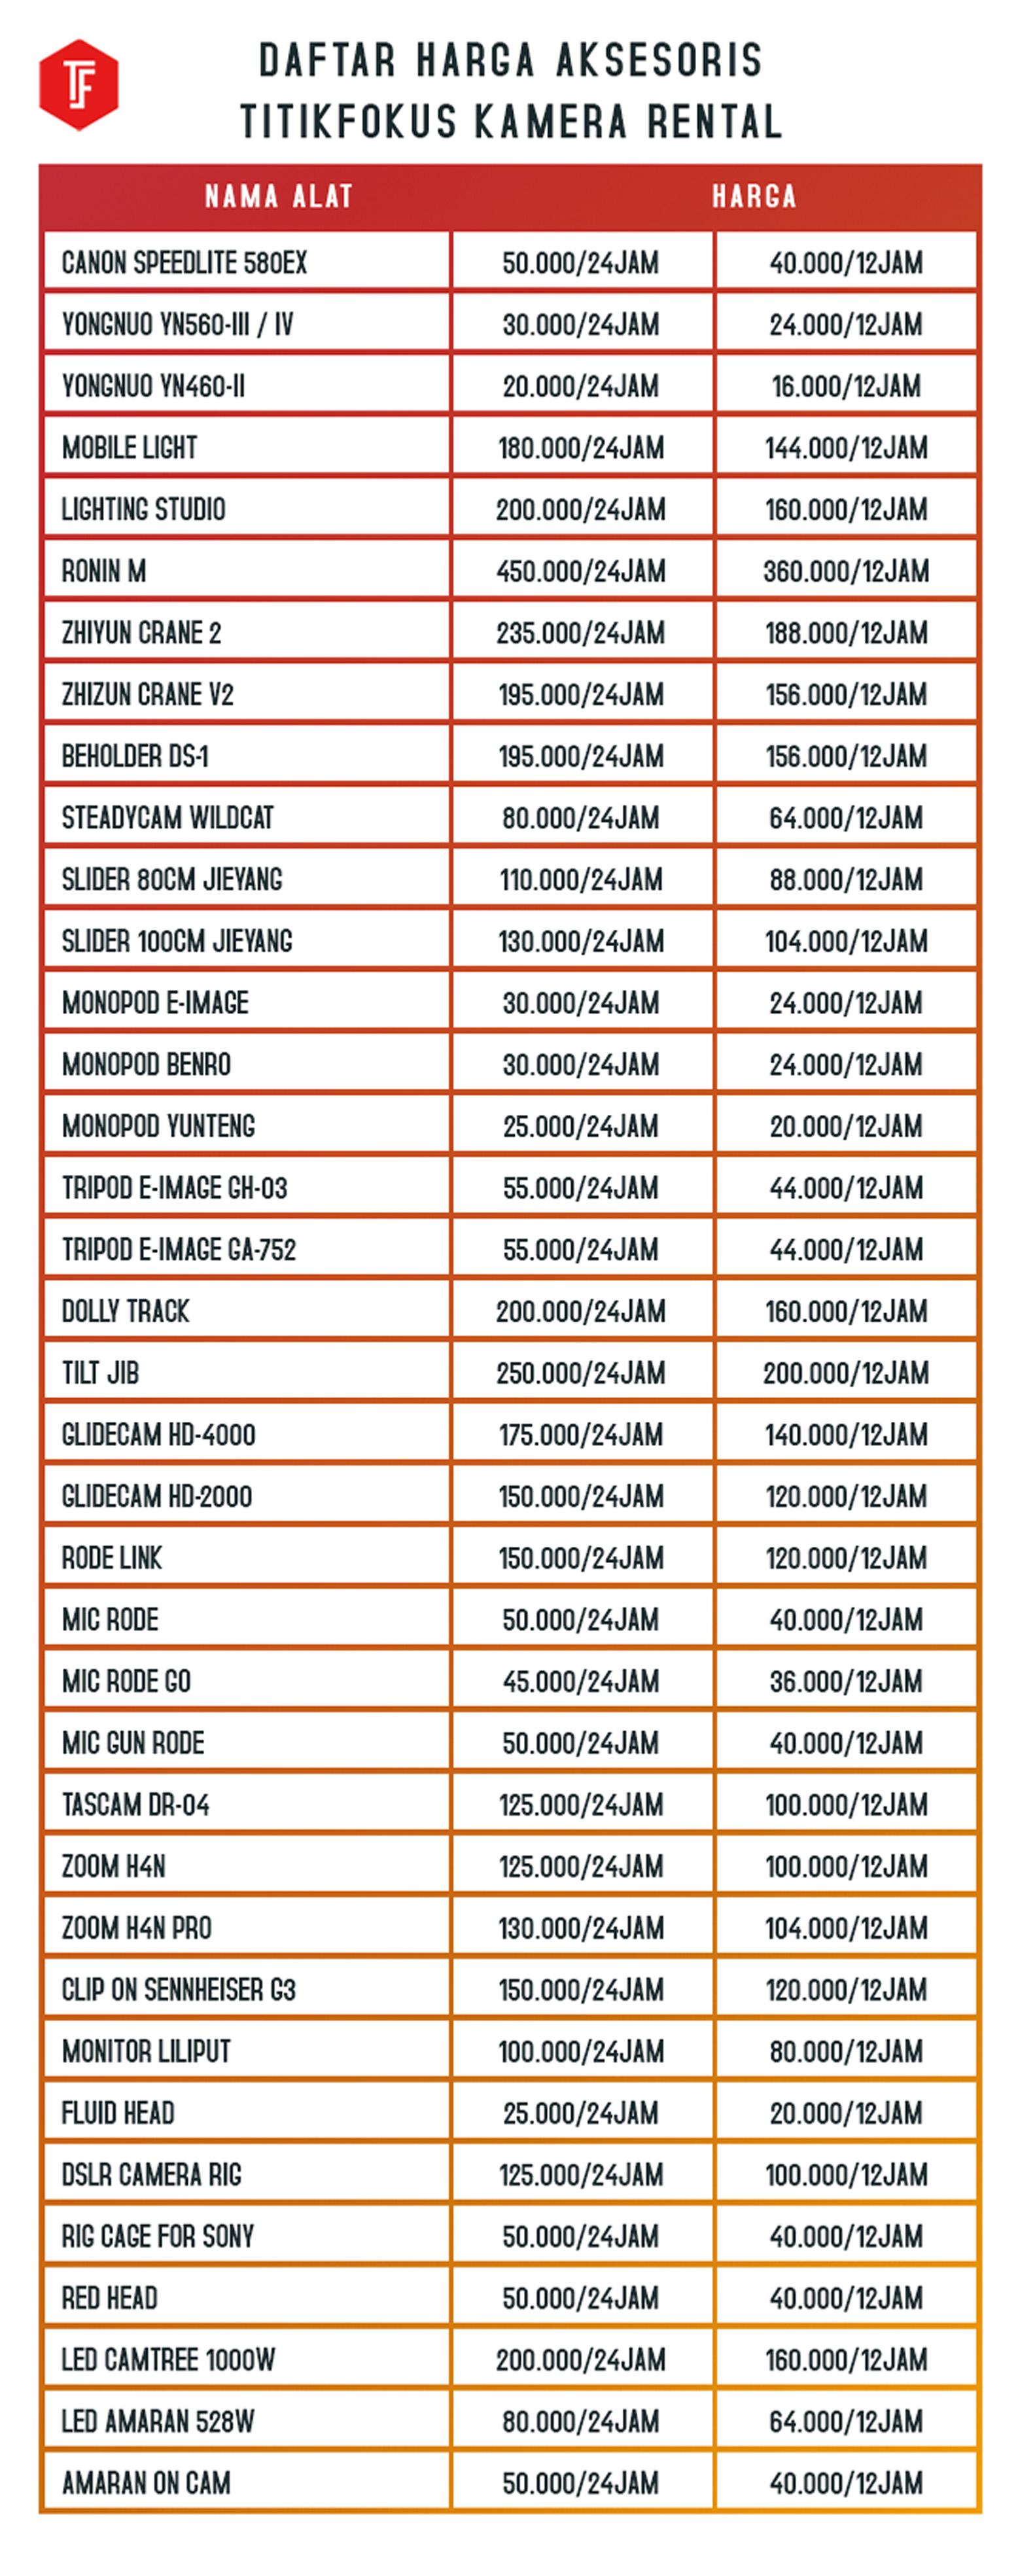 Daftar Harga TF Aksesoris Purwokerto